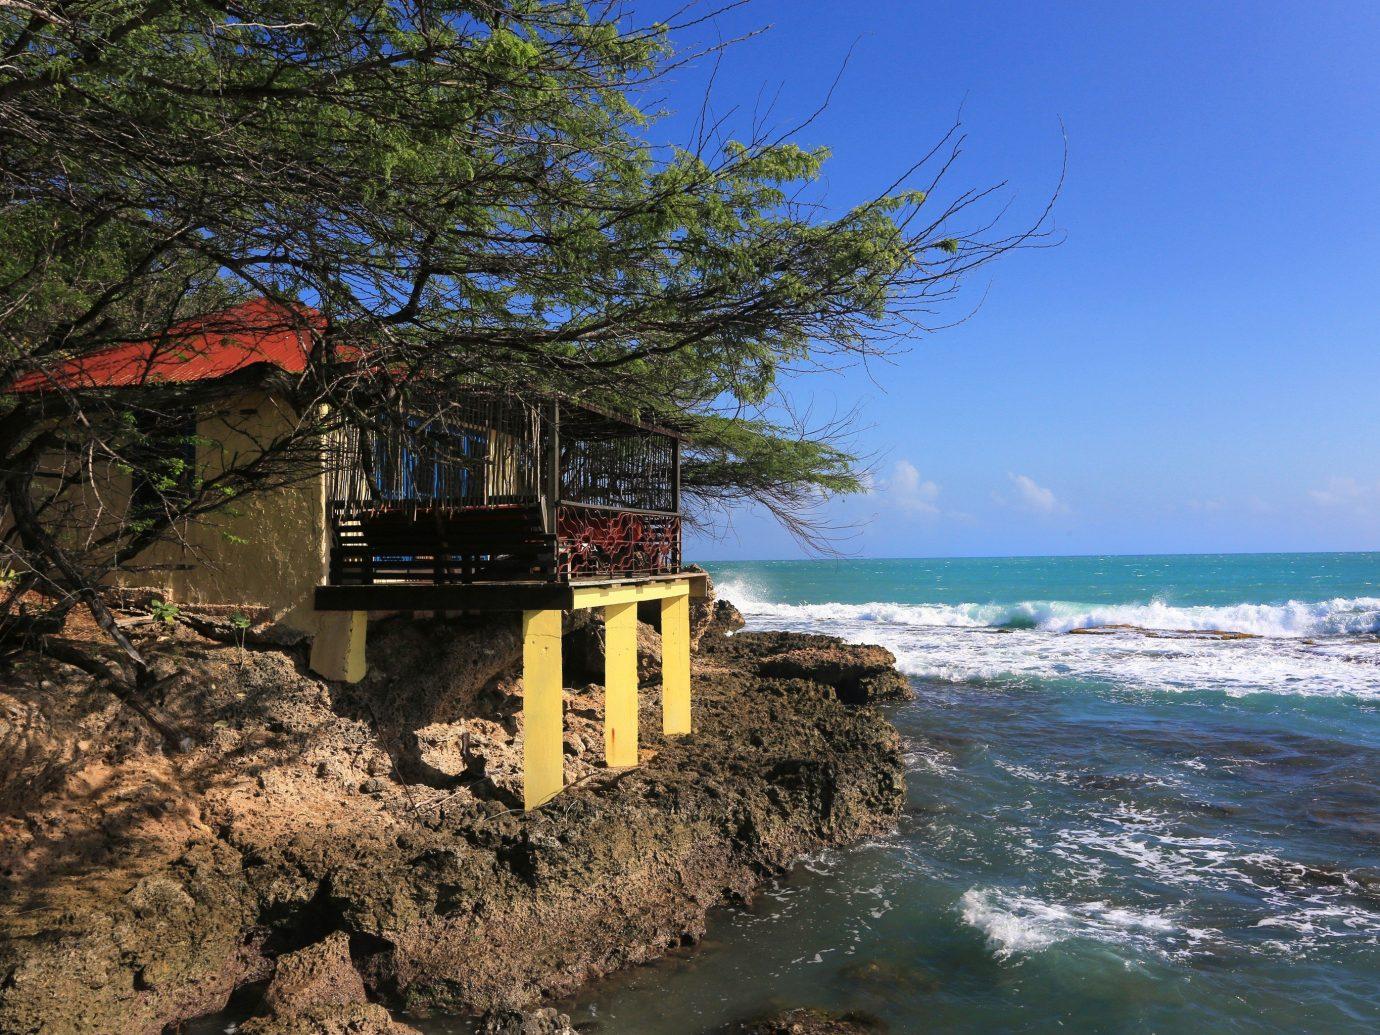 Hotels Romance tree outdoor sky Coast Sea Ocean shore vacation cliff Nature Beach terrain bay vehicle cape tower stone day